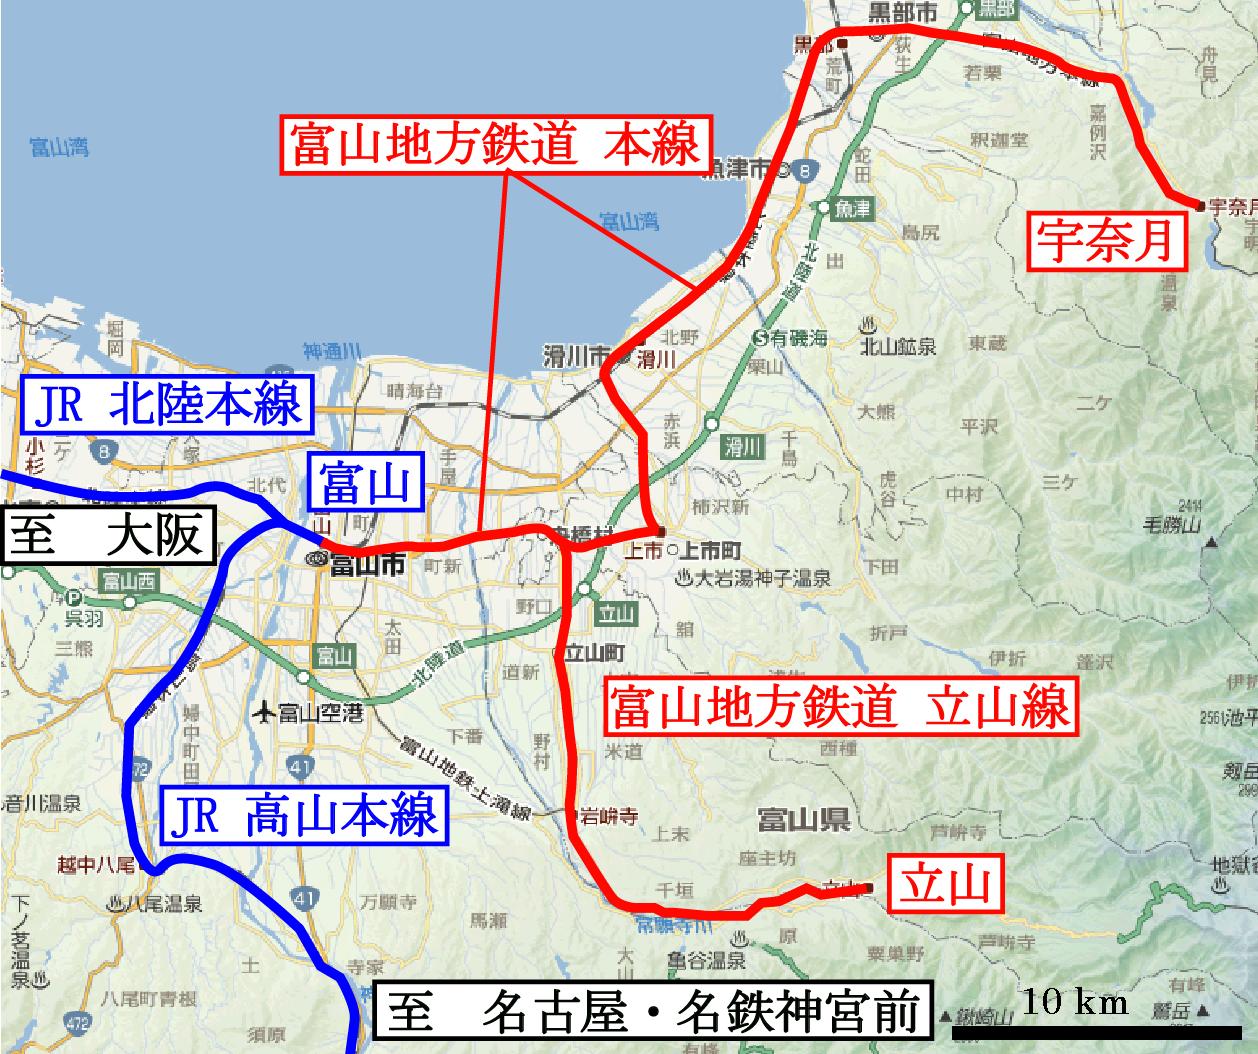 太郎の部屋 JRの急行・特急列車...